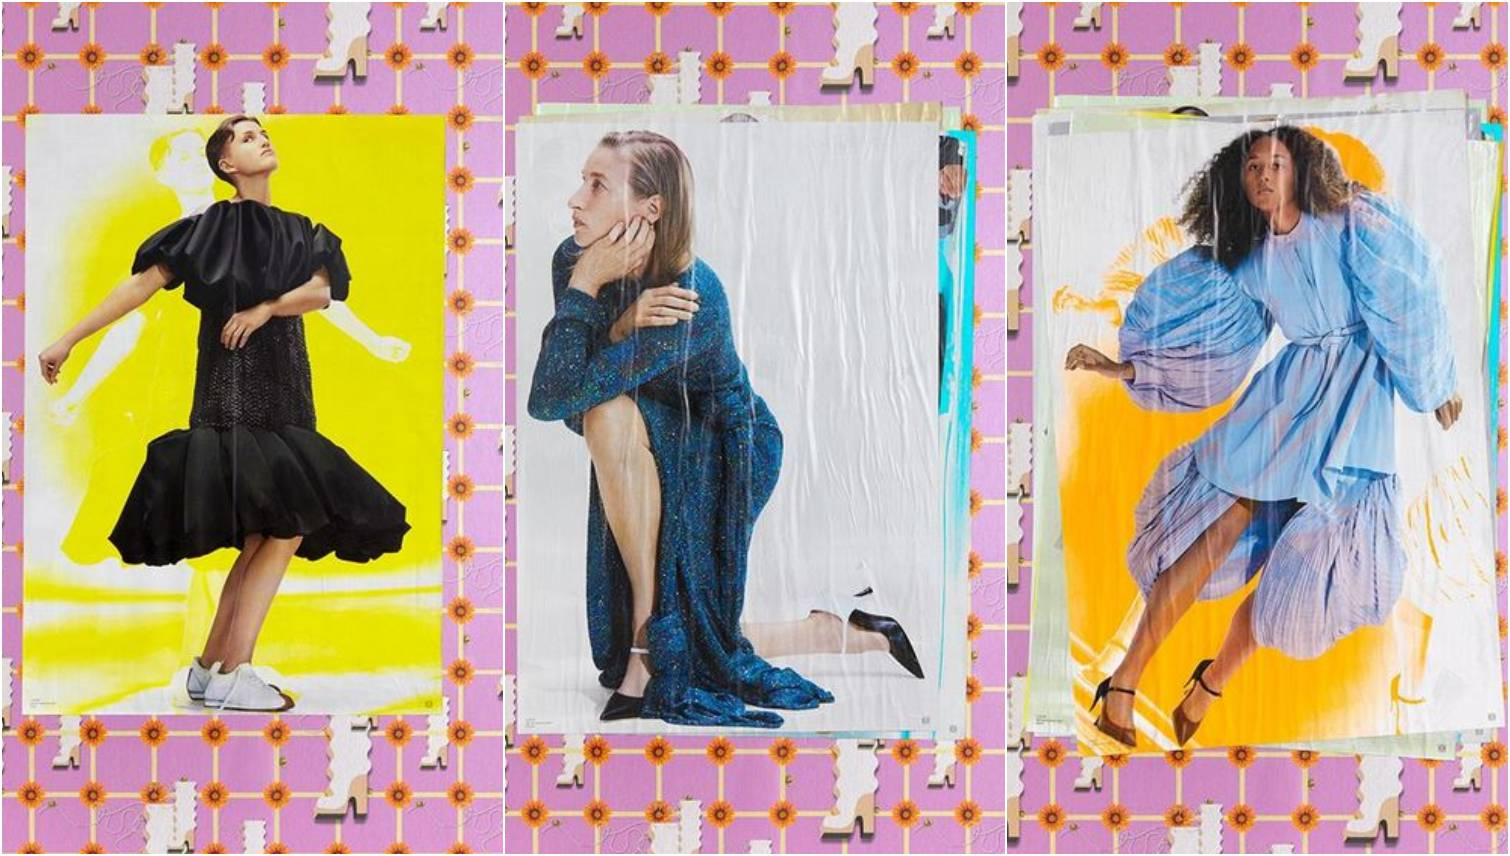 Jonathan Anderson za Loewe: Velike haljine na posterima, tapete i salonke s plaštom